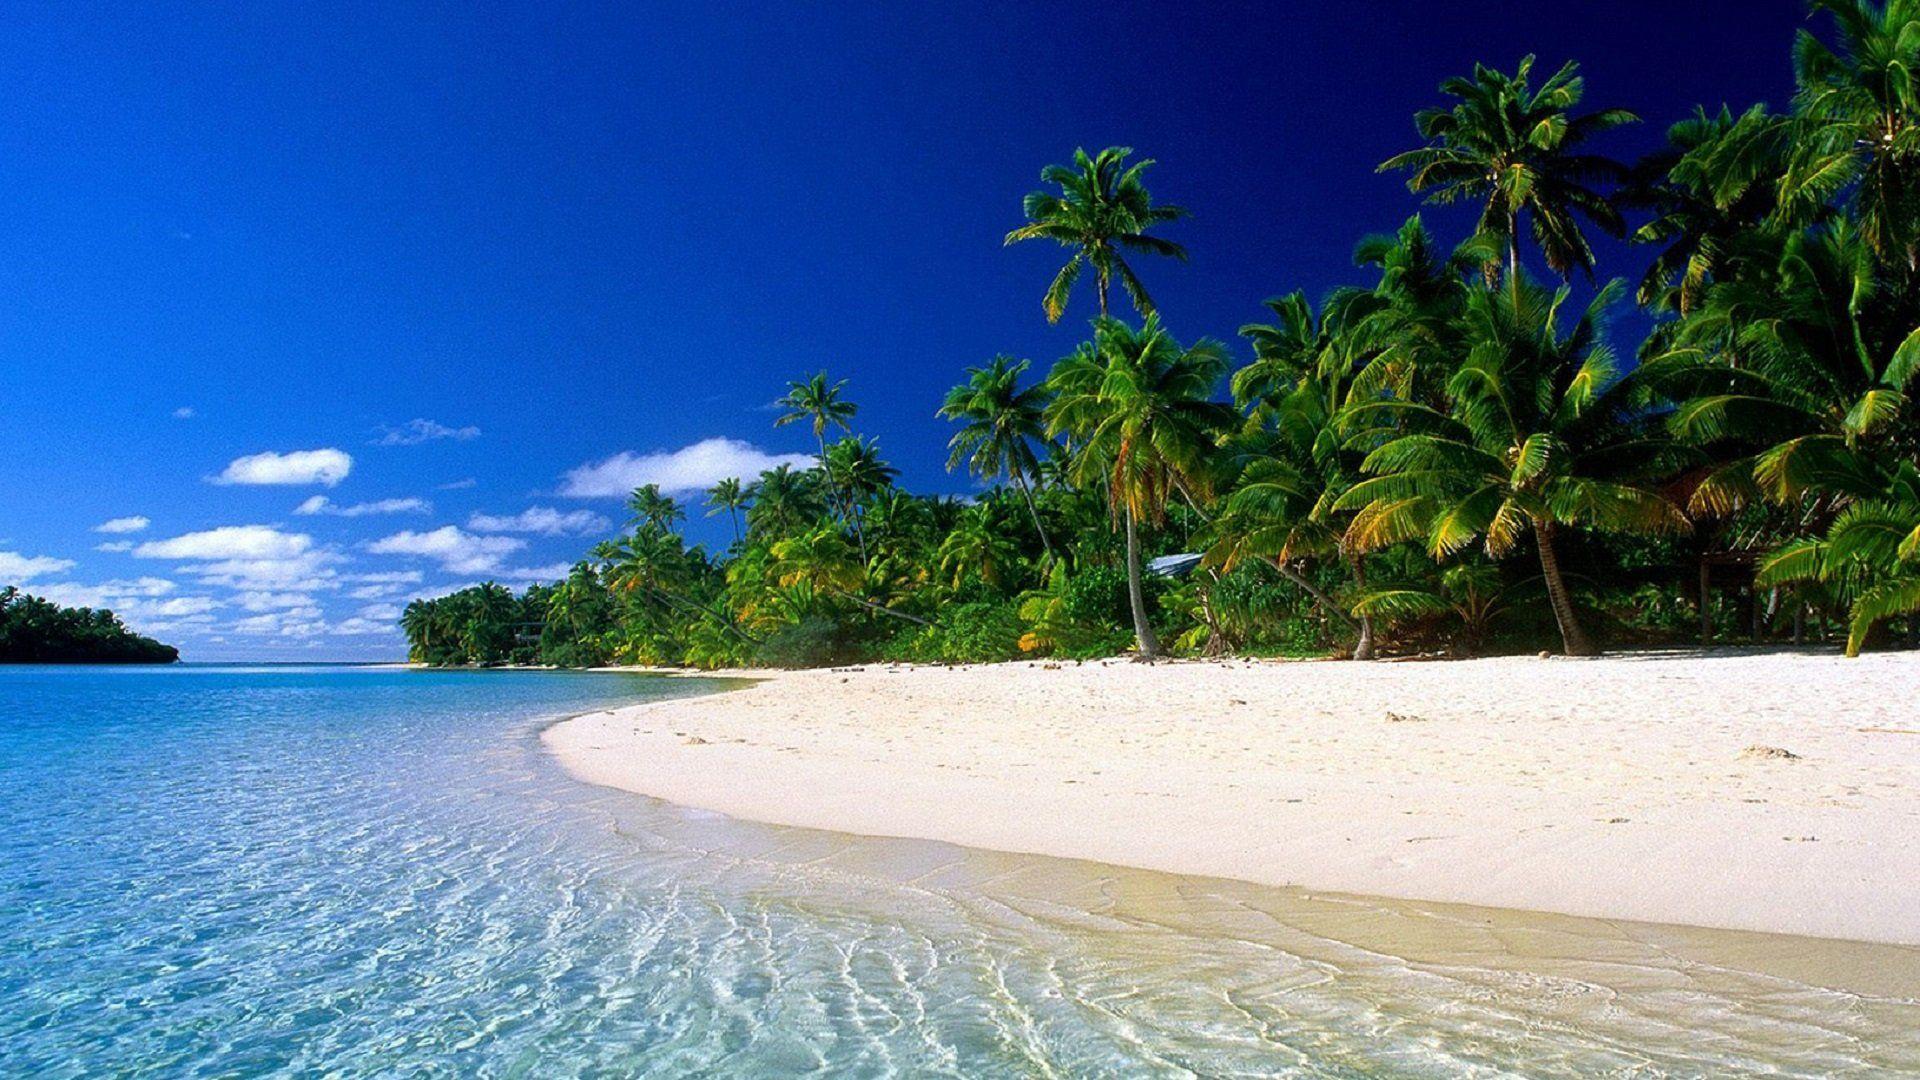 Dreamies De Strand Wallpaper Strandlandschaft Tropische Strande